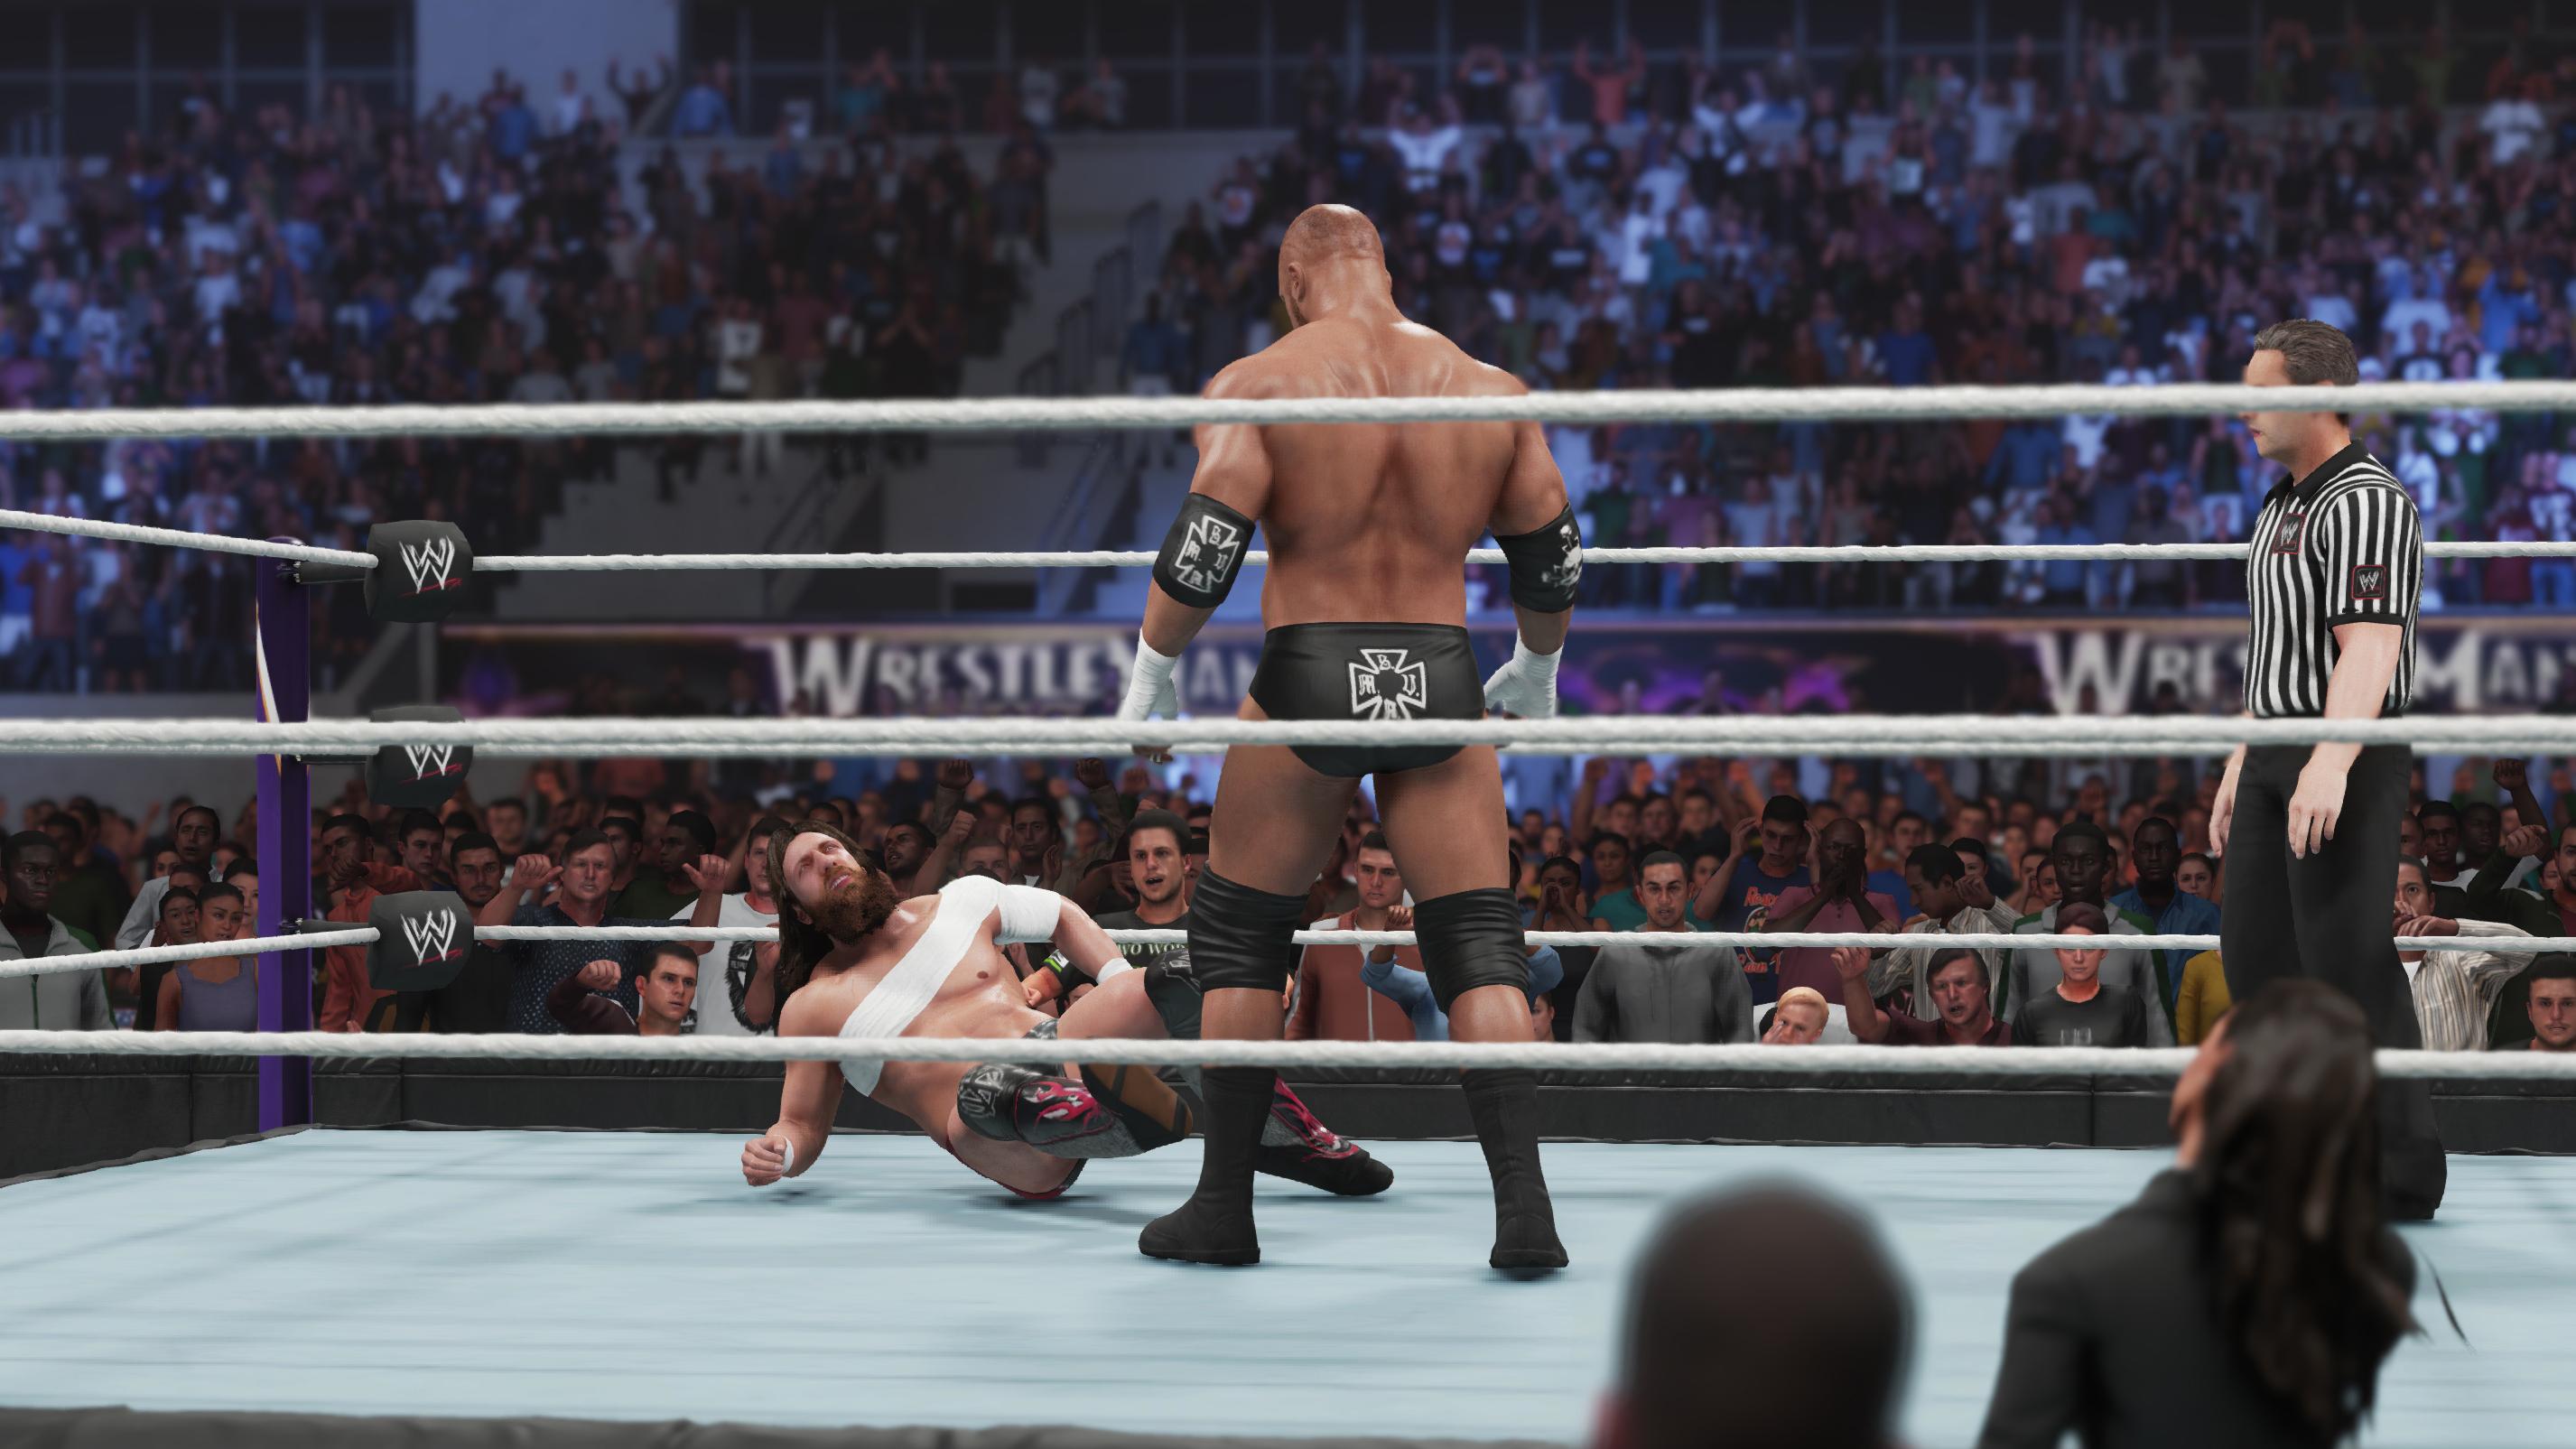 WWE screenshot in the ring